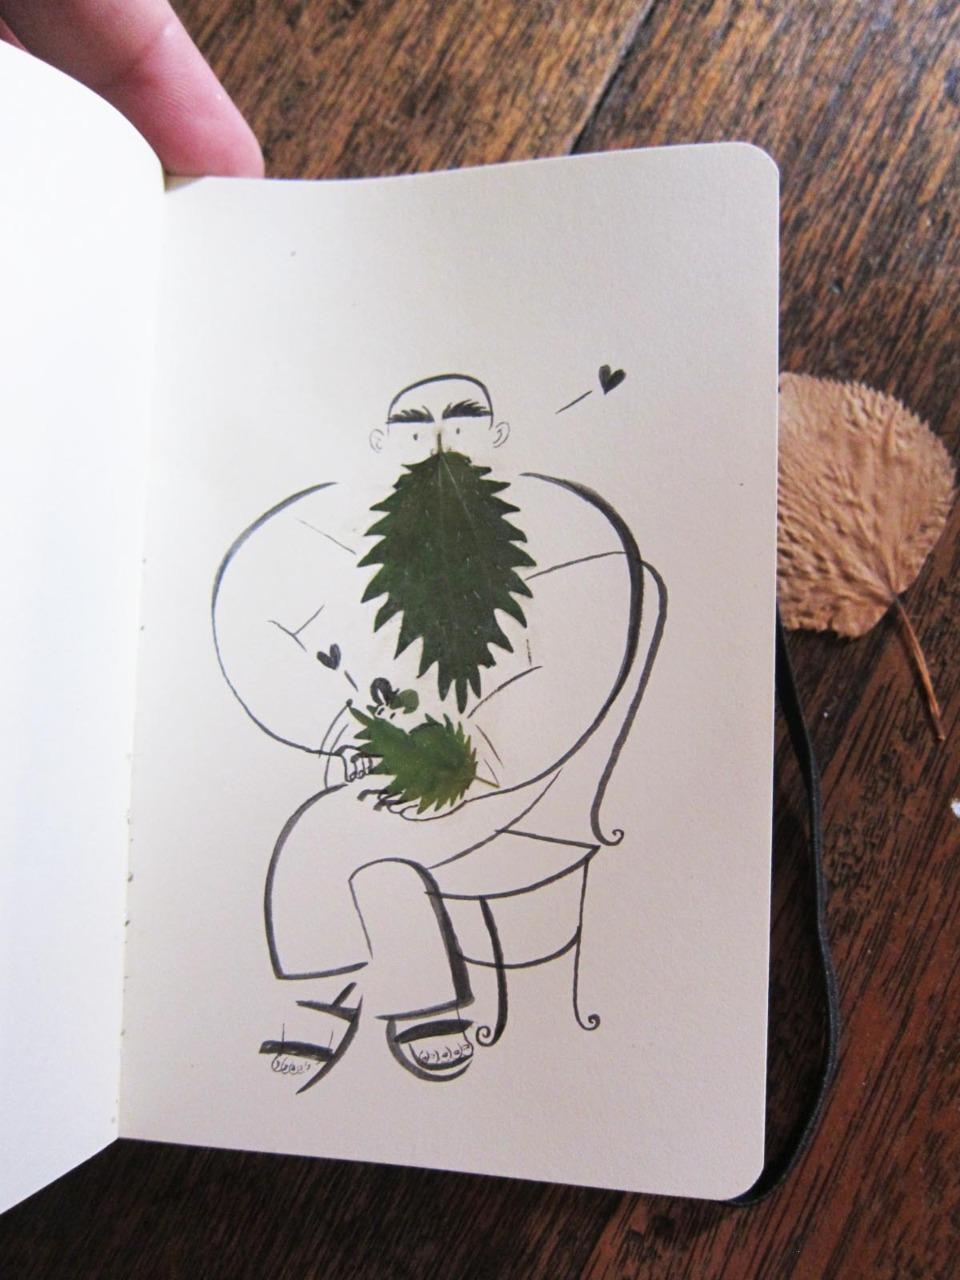 herbier feuille illustration 04 Un herbier illustré